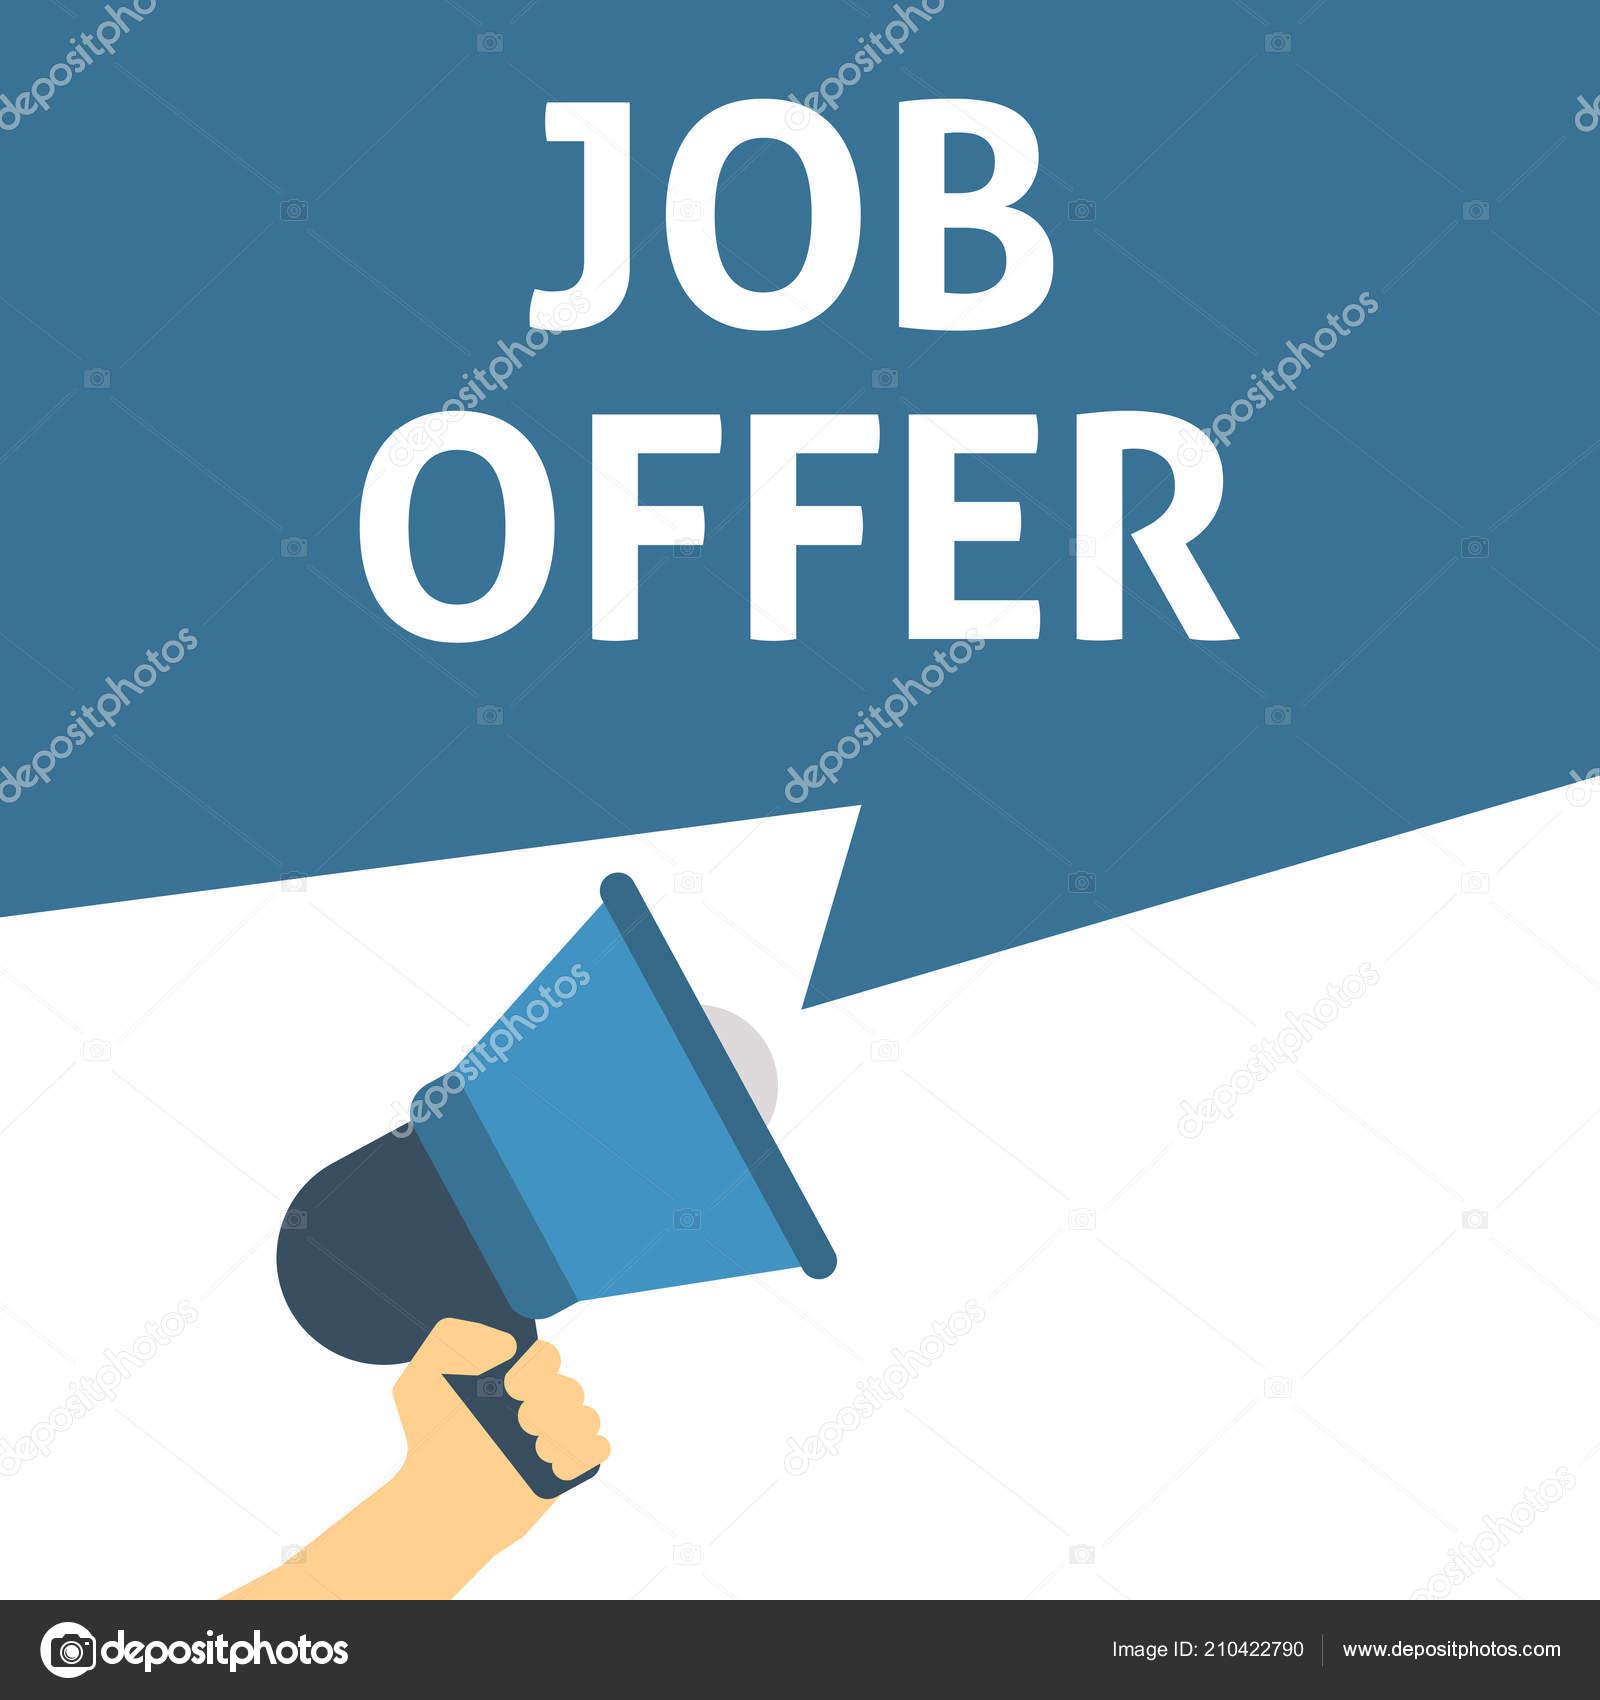 3a71b24faa Ανακοίνωση προσφοράς θέσεων εργασίας. Χέρι που κρατά το μεγάφωνο με  συννεφάκι ομιλίας. Αίτηση εργασίας. Αναζήτηση εργασίας online καριέρα.  Προσλήψεις.